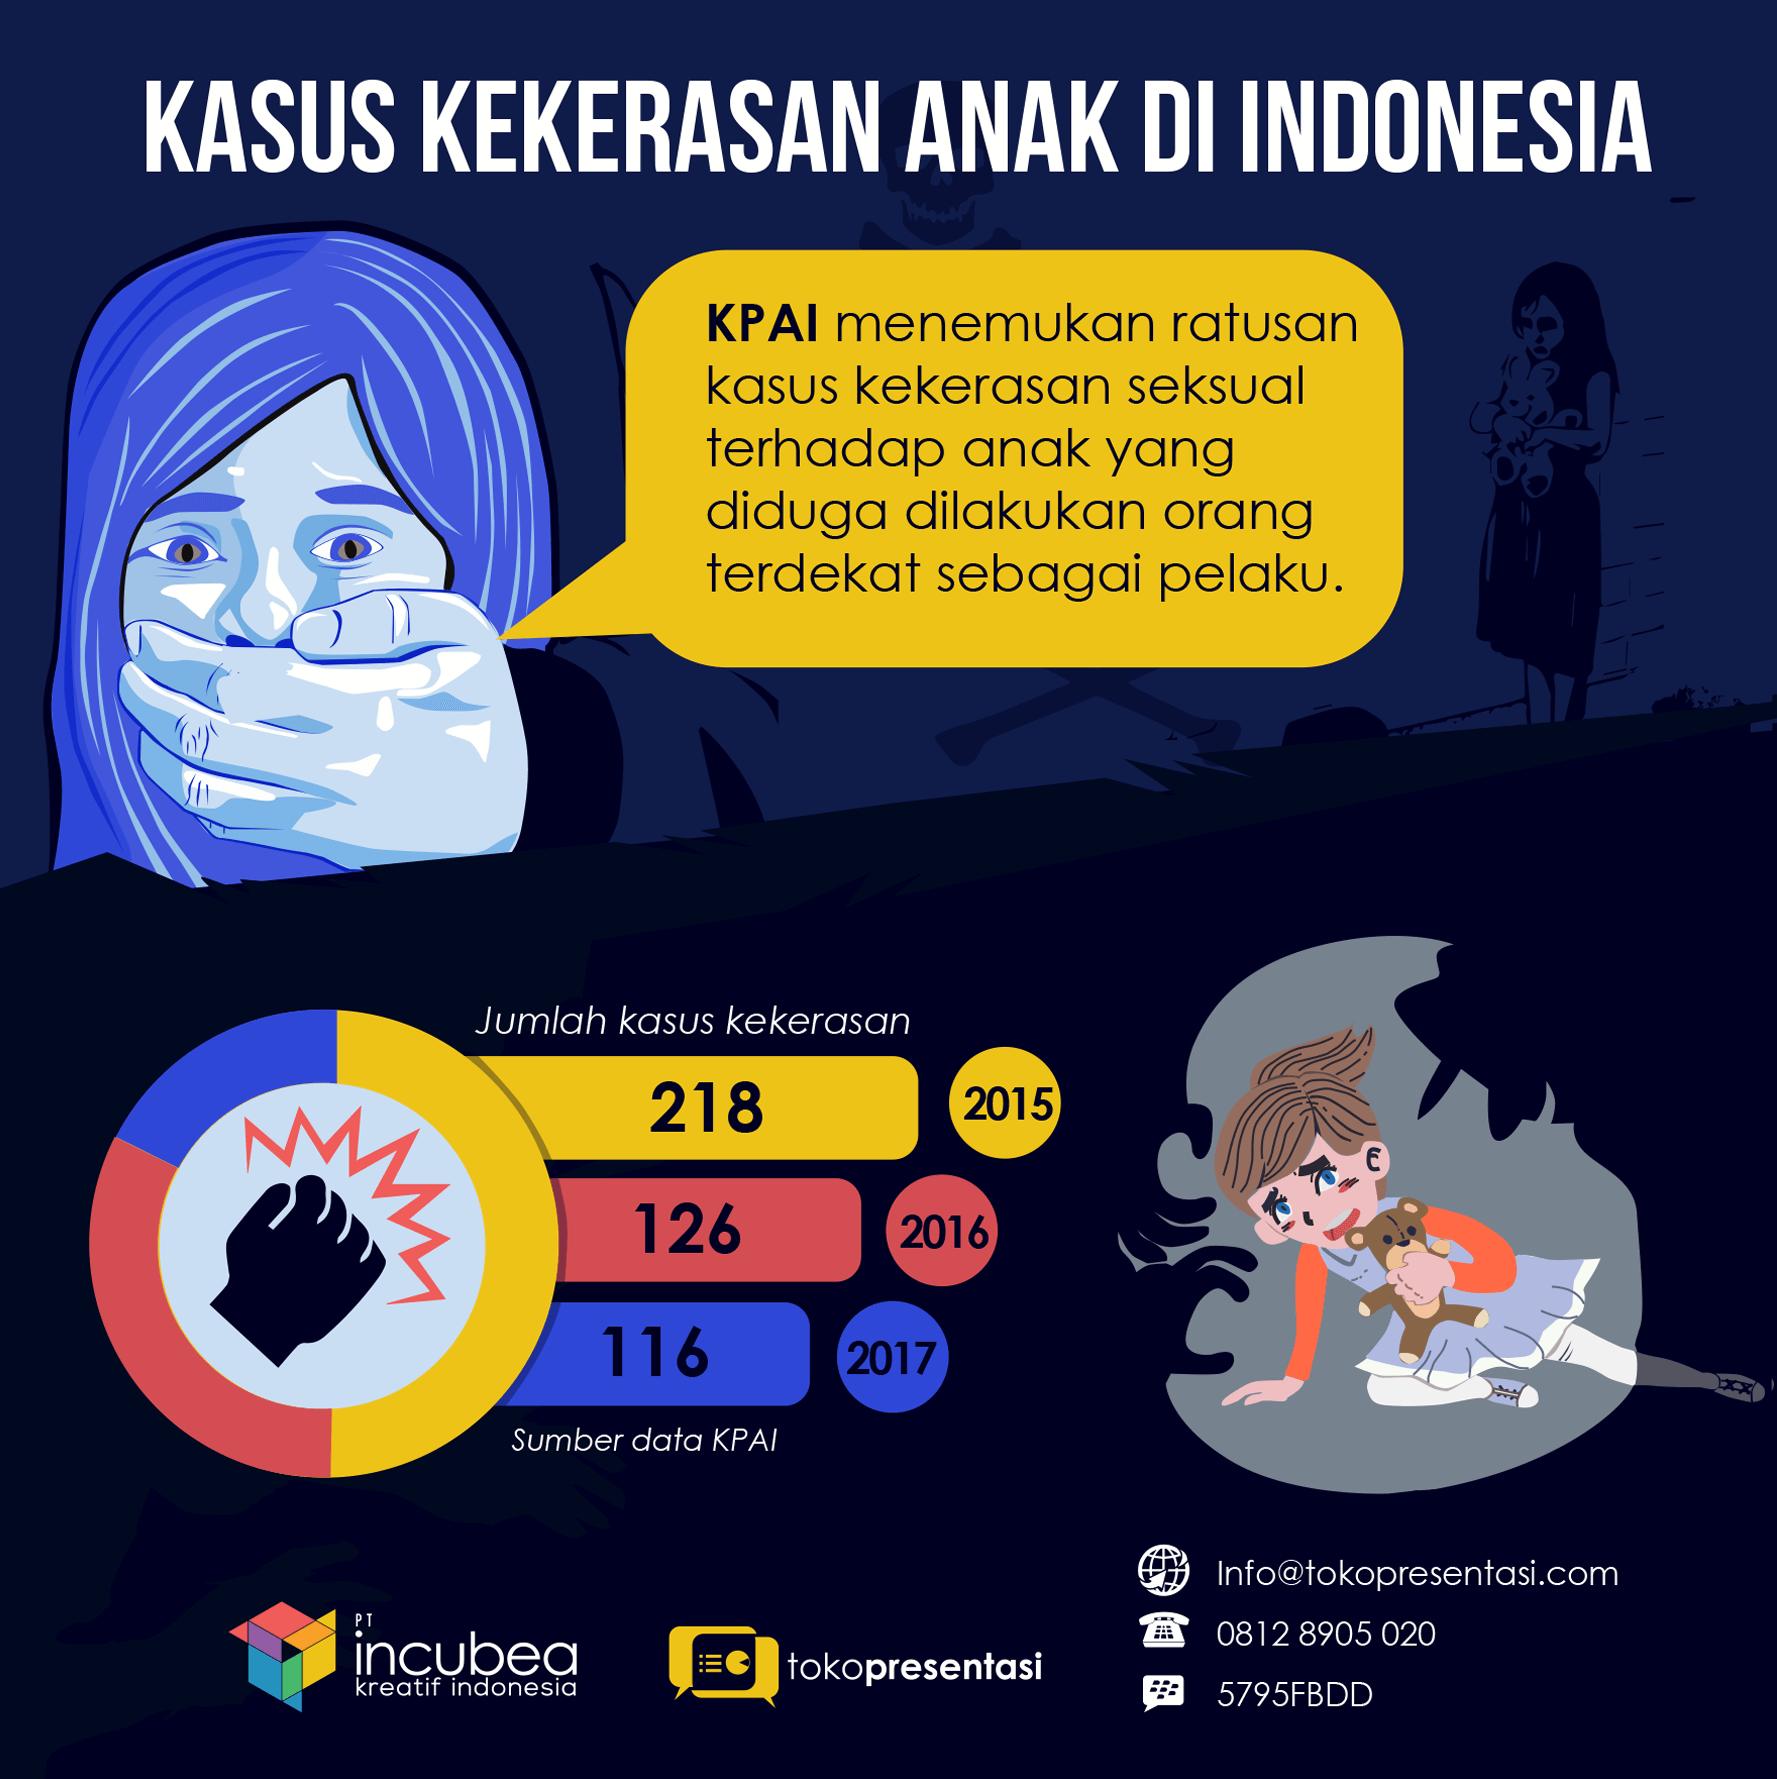 infografis kekerasan anak tokopresentasi (2)